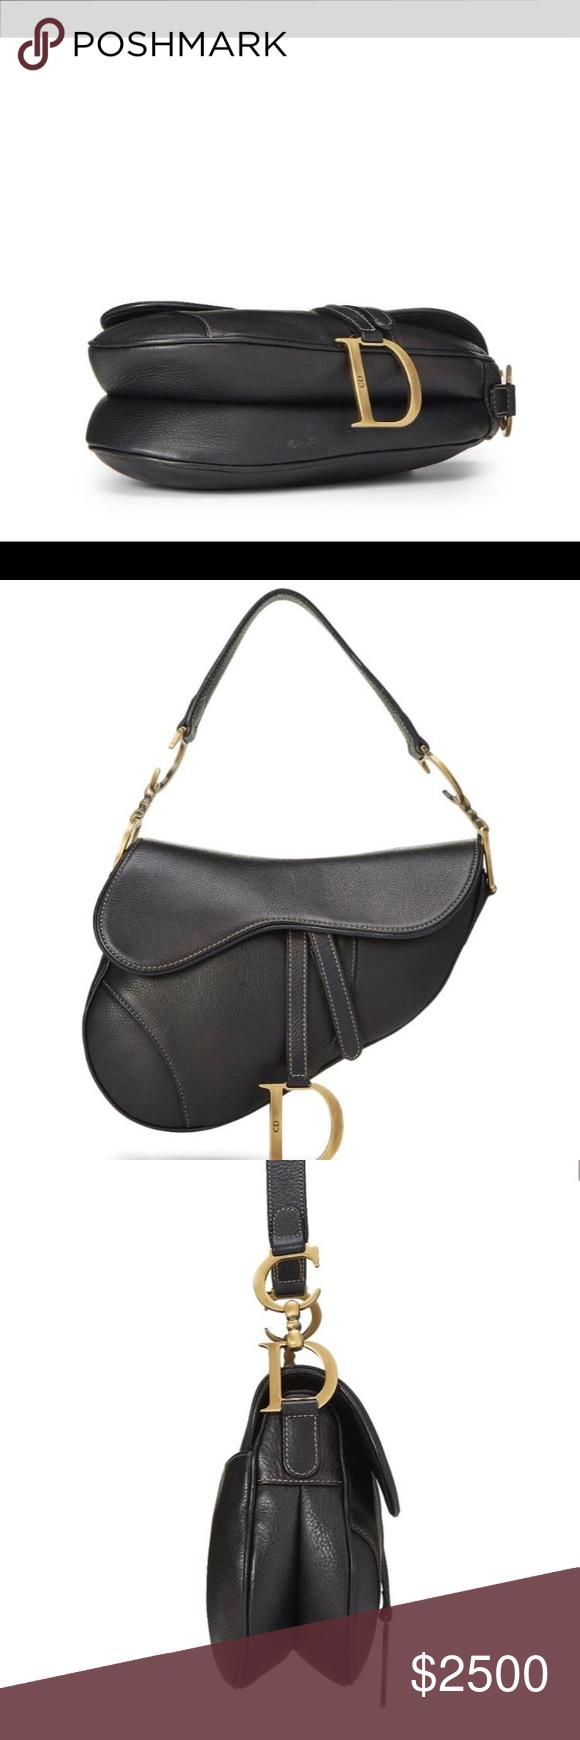 I just added this listing on Poshmark  Christian Dior Saddle Bag.   shopmycloset  poshmark  fashion  shopping  style  forsale  Dior  Handbags 40f565fdc1